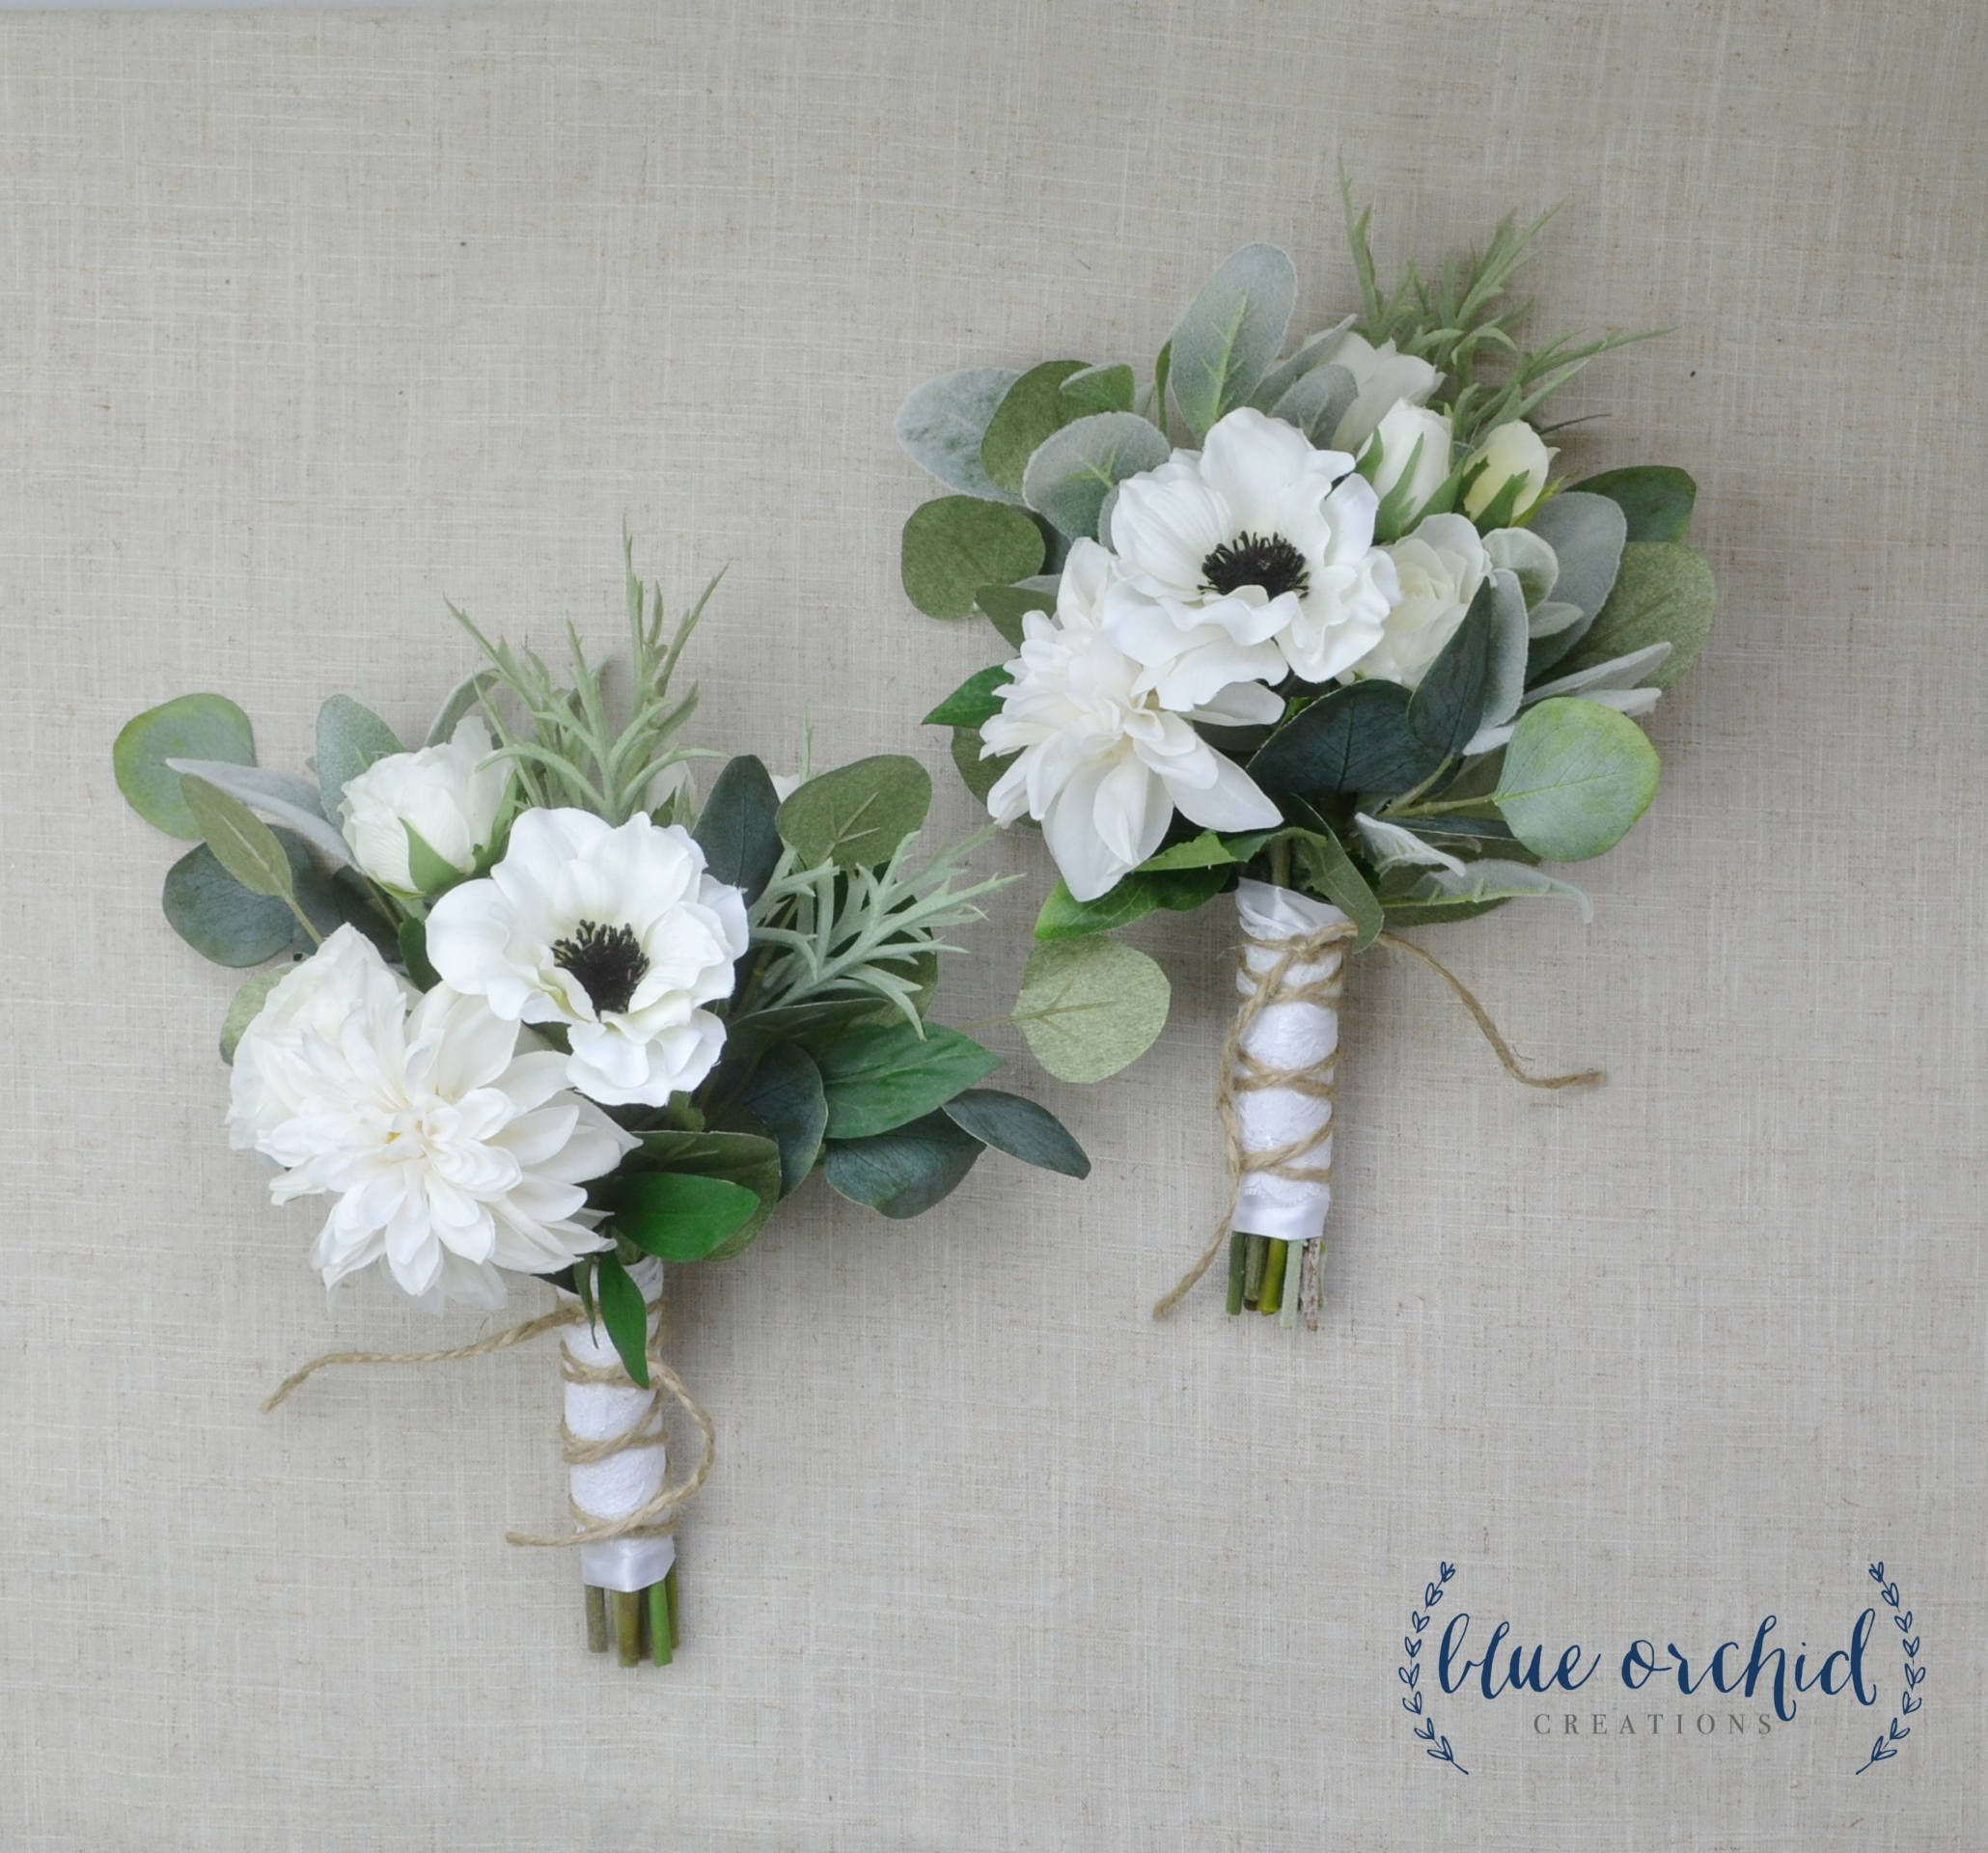 Bridesmaid Bouquet, Wedding Flowers, Silk Bridesmaid Bouquet, Bridesmaid Bouquets, Artificial Bouquet, Wedding Bouquet, Wedding Flower Set #weddingbridesmaidbouquets